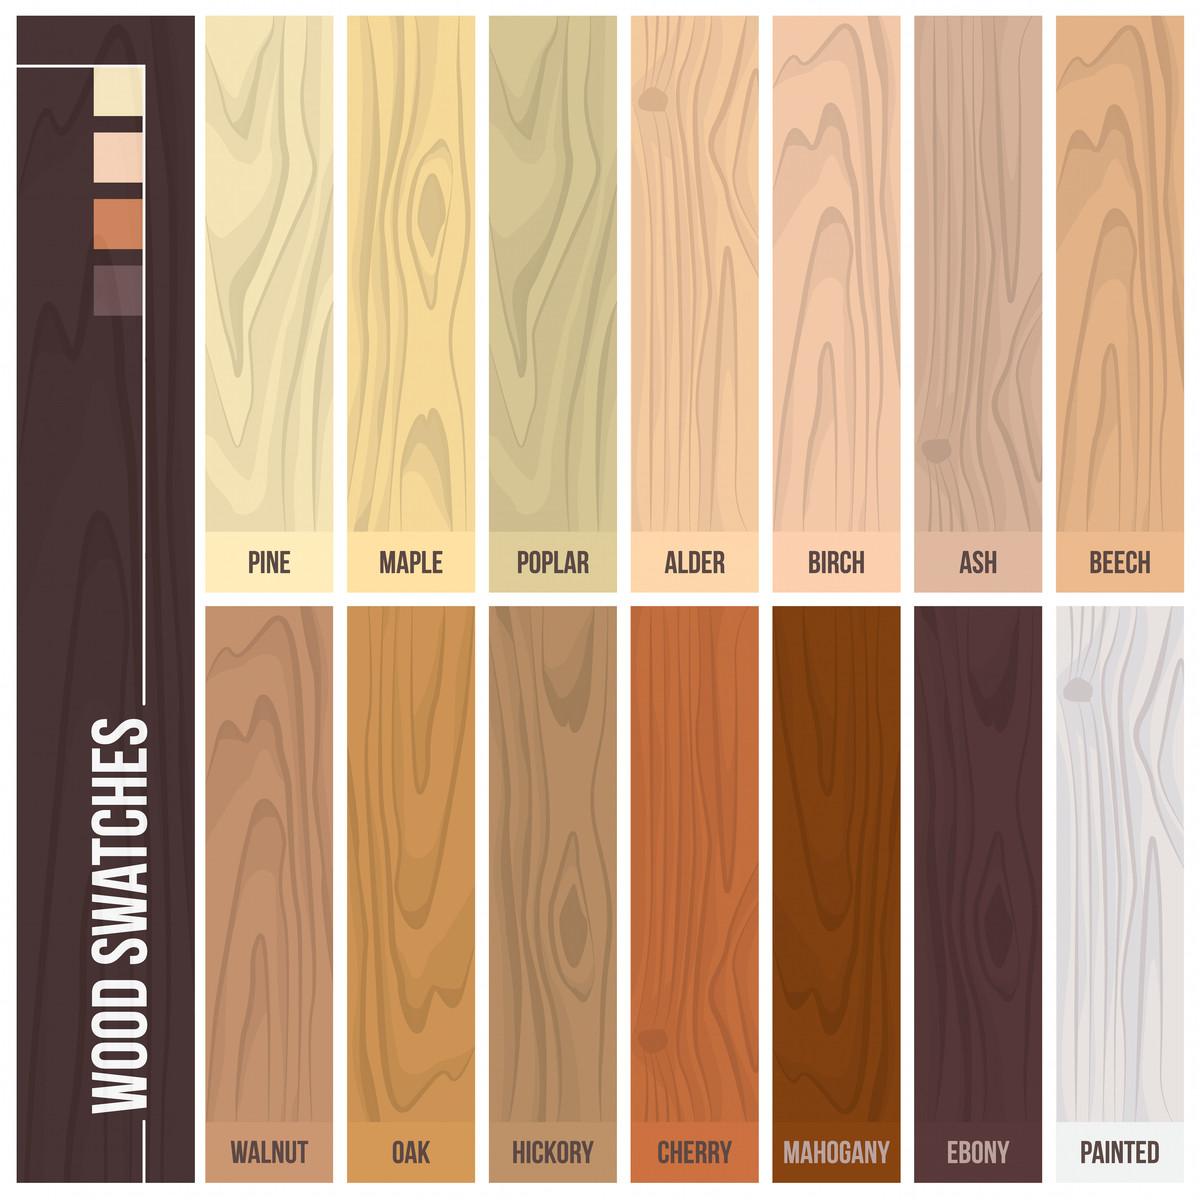 hardwood floor estimate calculator of 12 types of hardwood flooring species styles edging dimensions in types of hardwood flooring illustrated guide